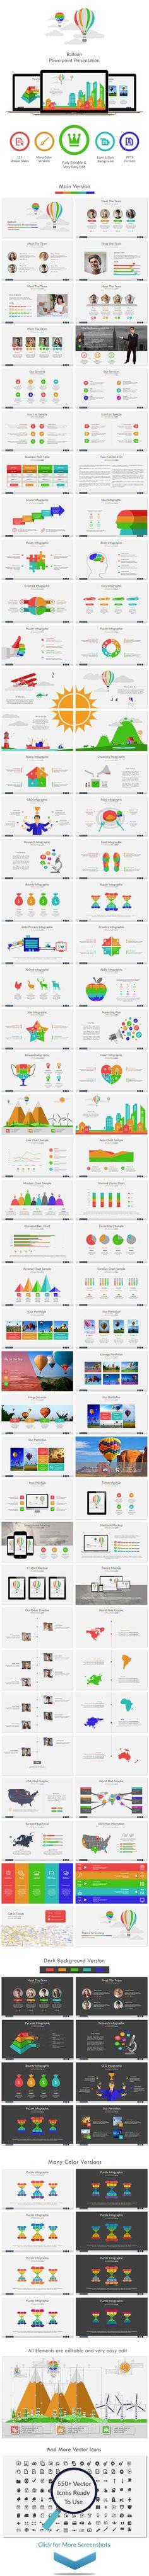 Balloon Powerpoint Template #design #slides Download: http://graphicriver.net/item/balloon-powerpoint/13584736?ref=ksioks